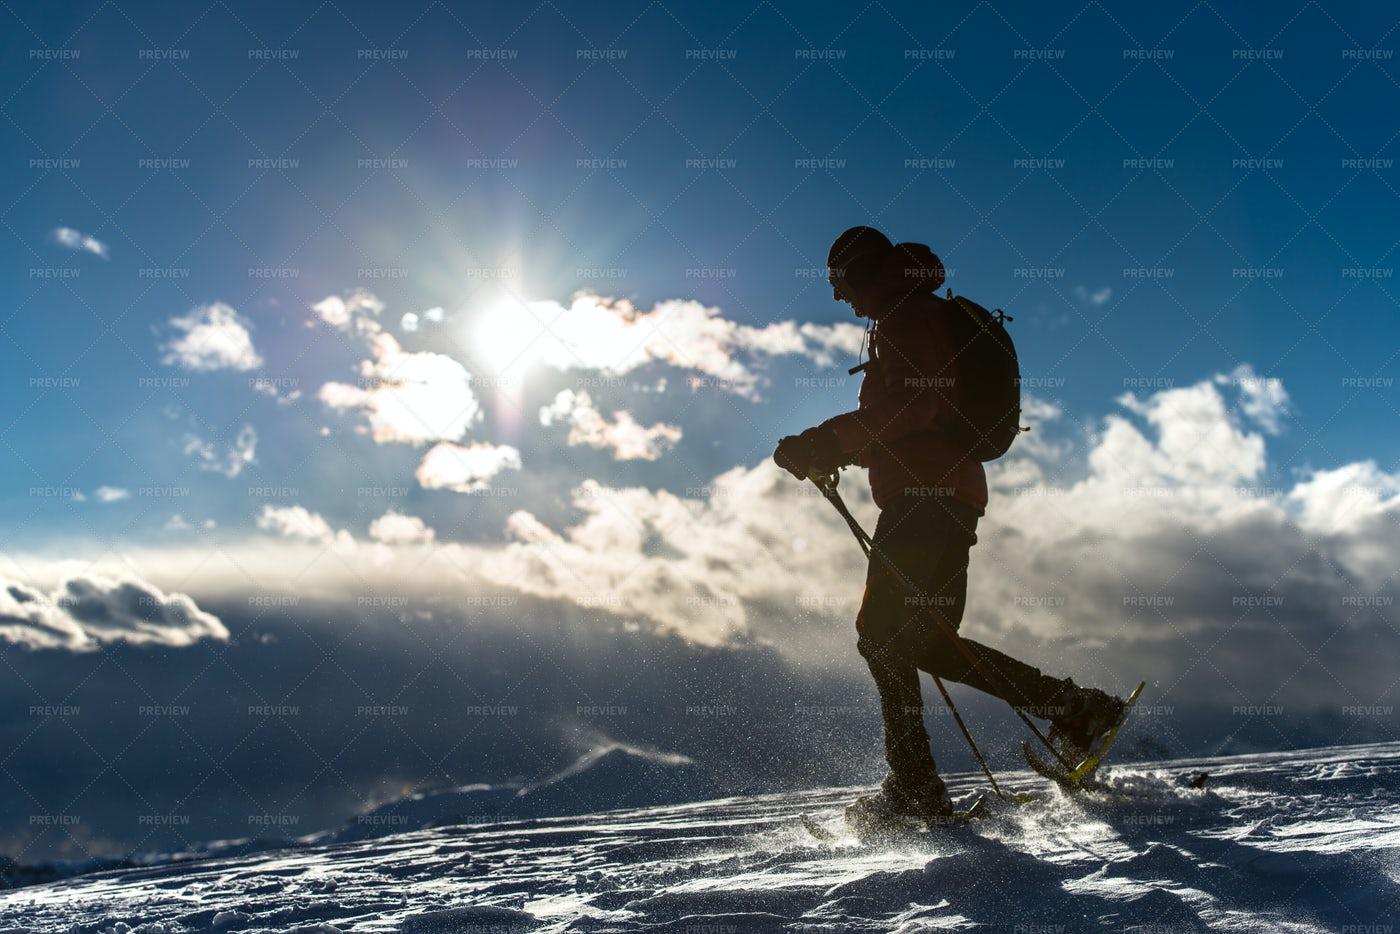 Man Walking In Snow: Stock Photos